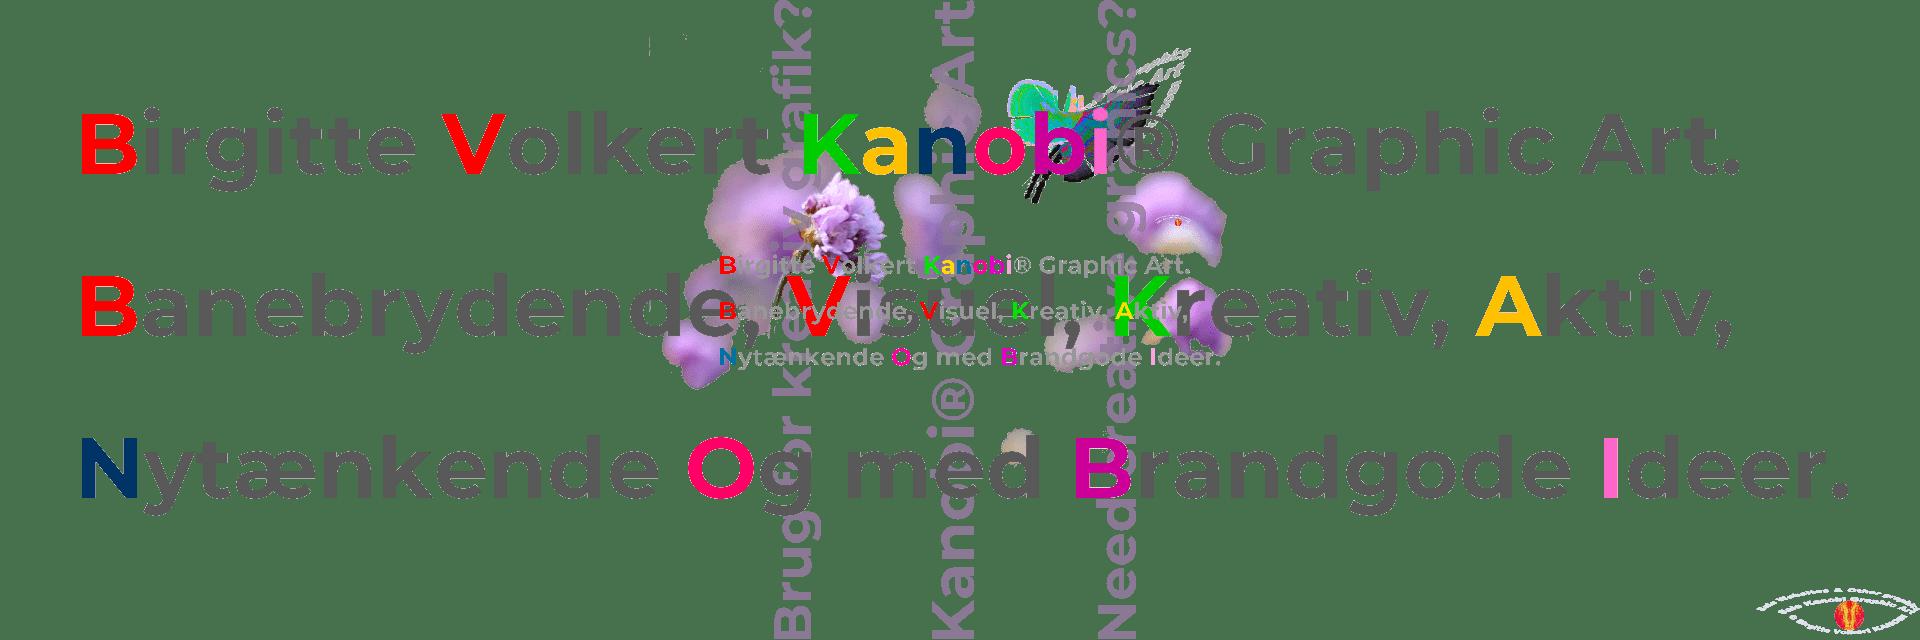 Link tekst text © Kanobi®